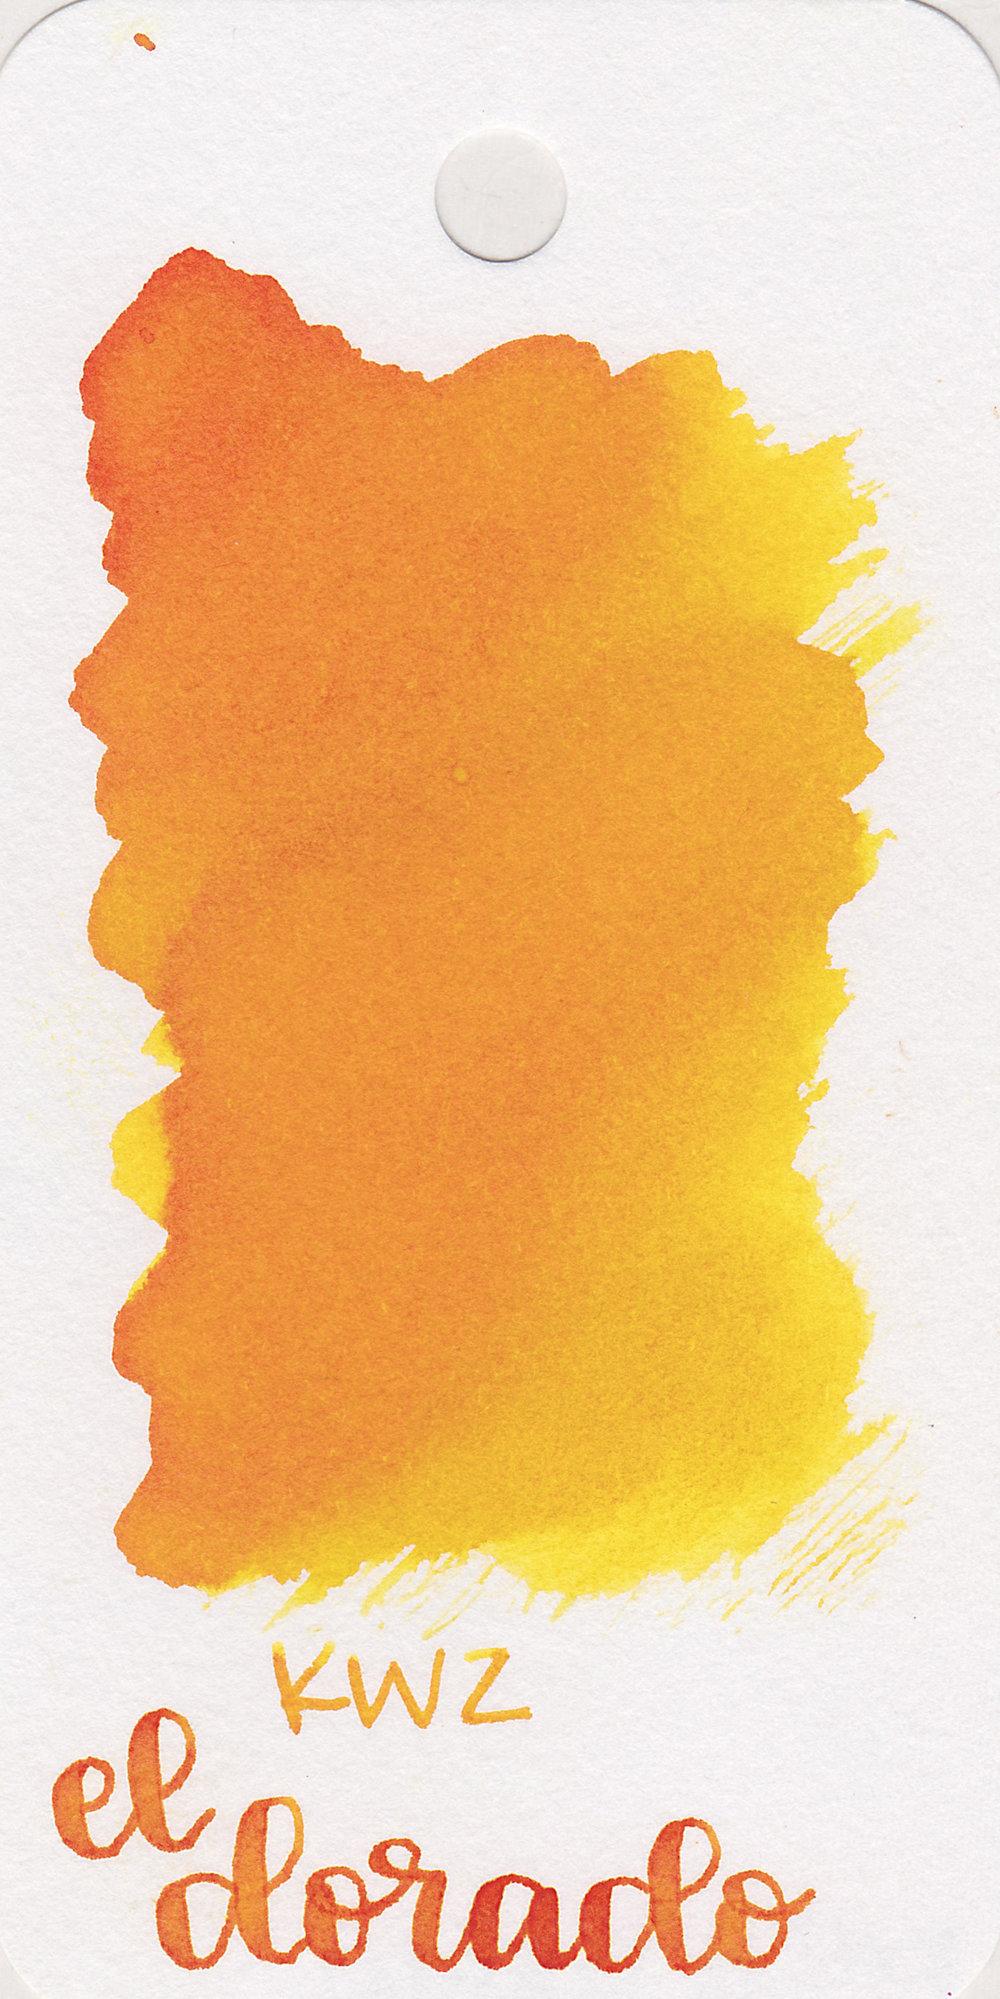 kwz-el-dorado-1.jpg